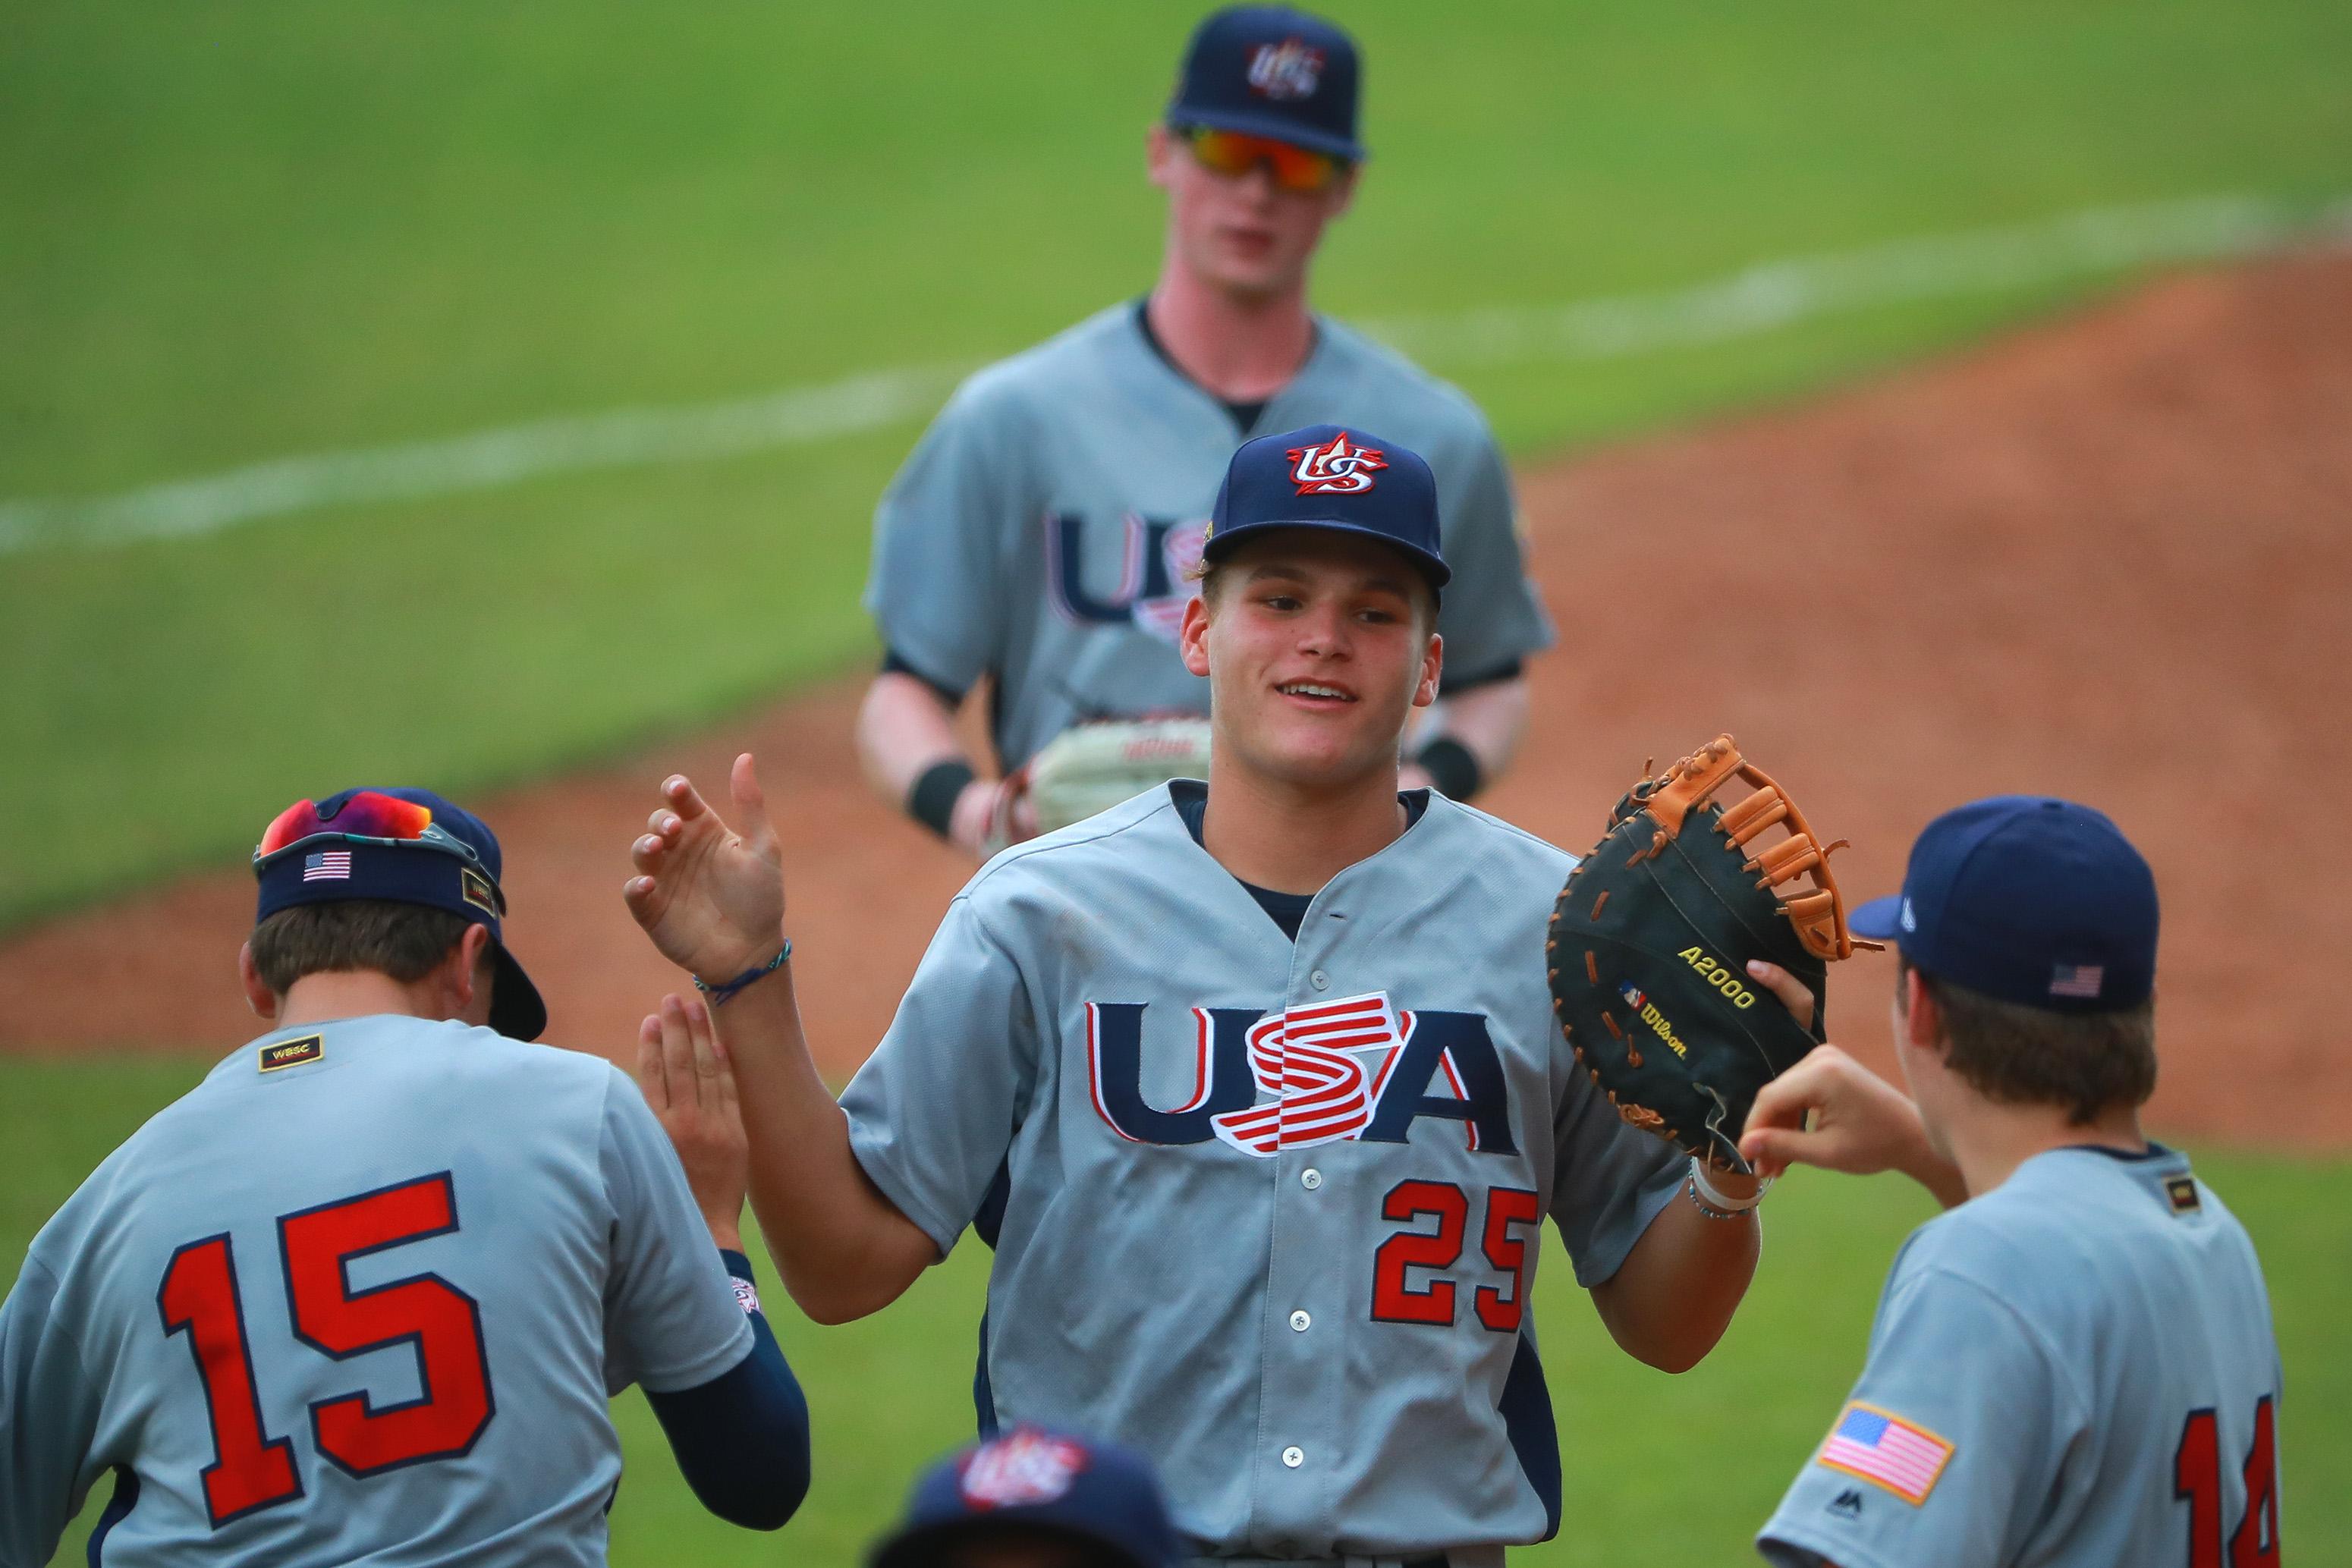 USA v Cuba - WBSC U-15 World Cup Super Round